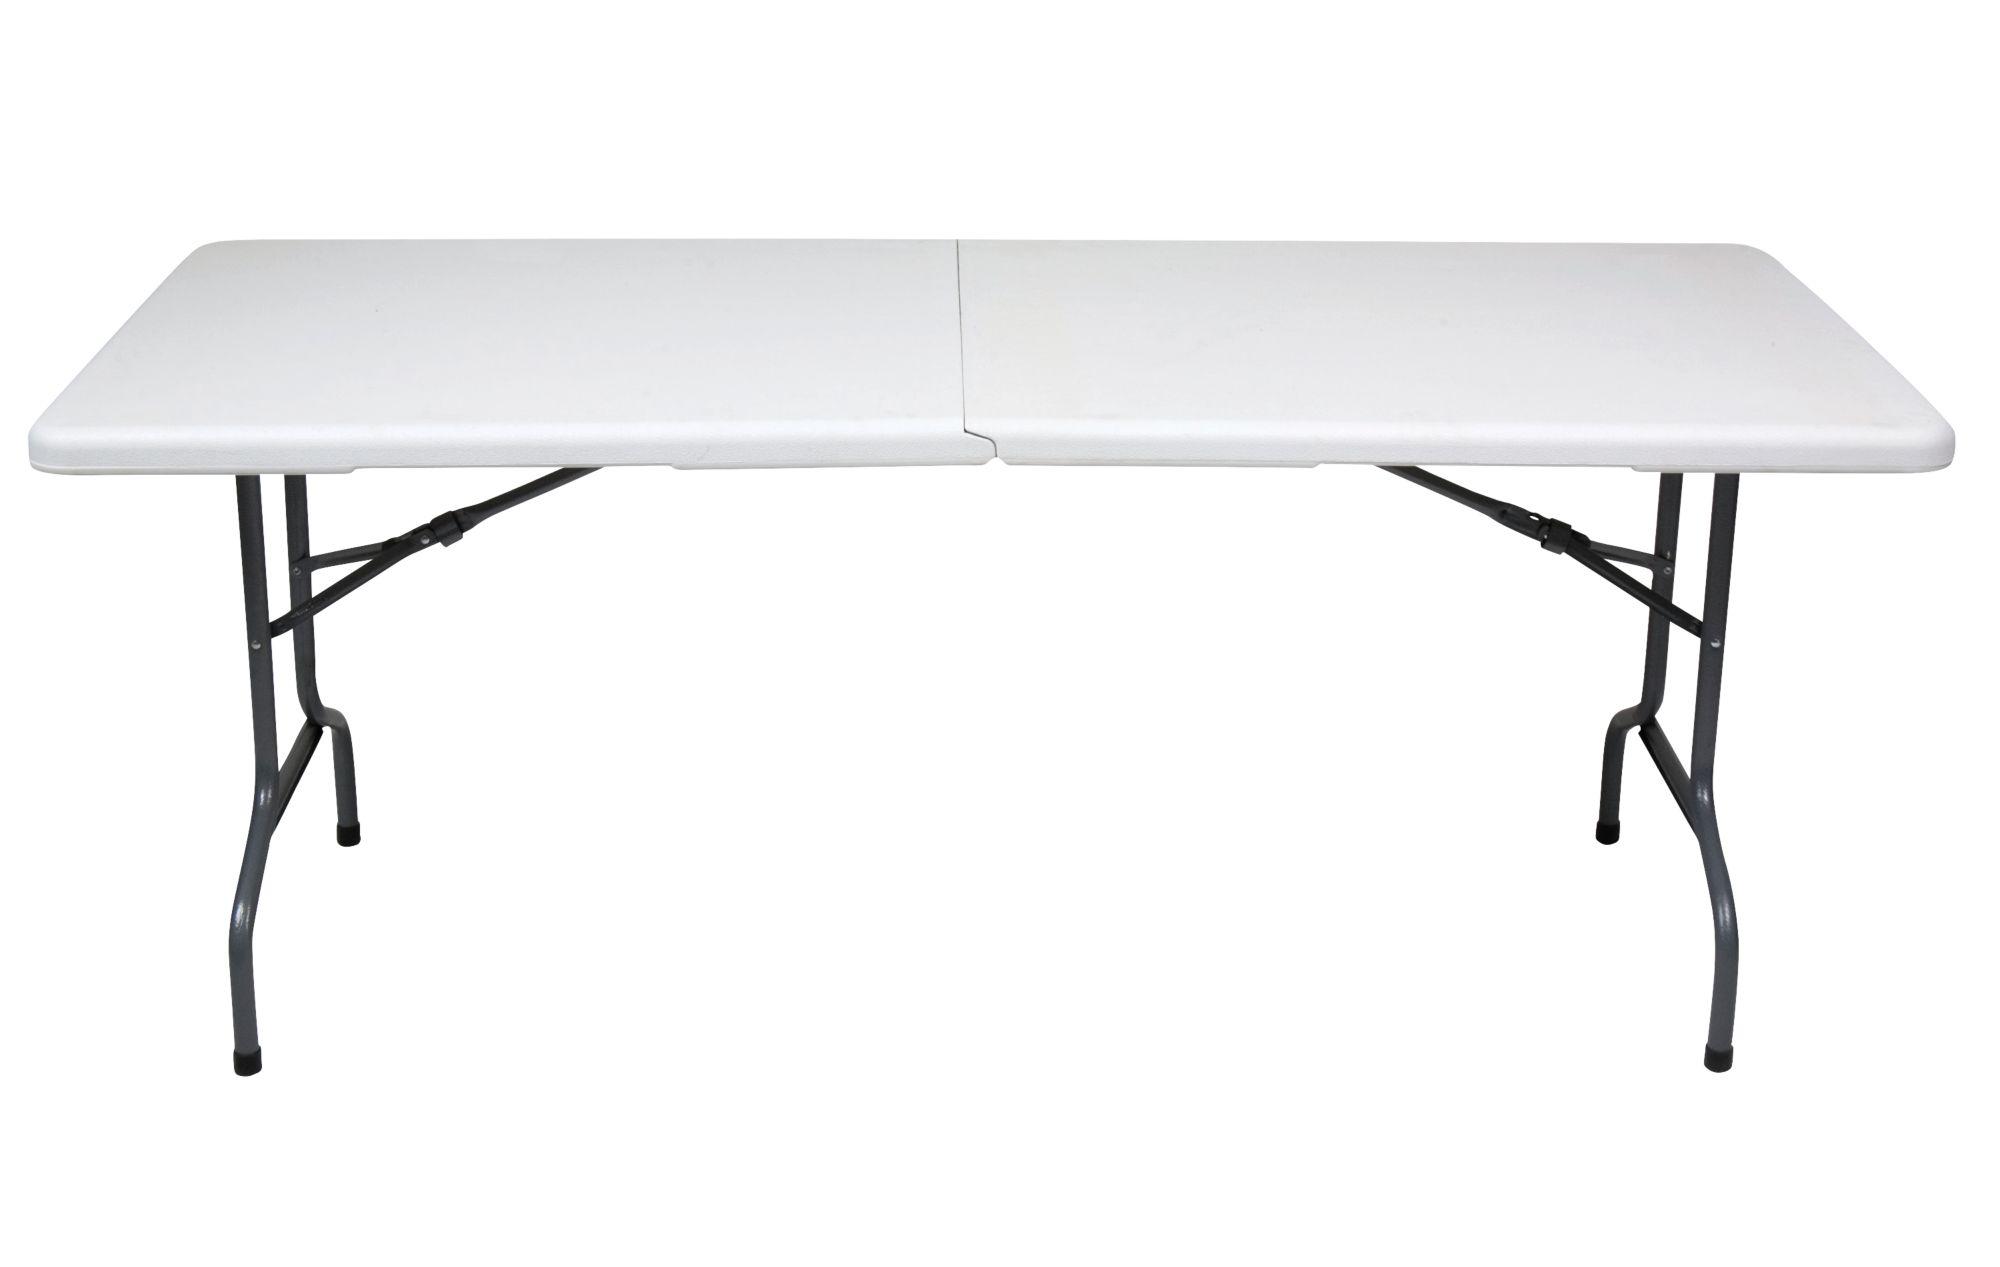 Enduro 5 Ft. Center Folding Table